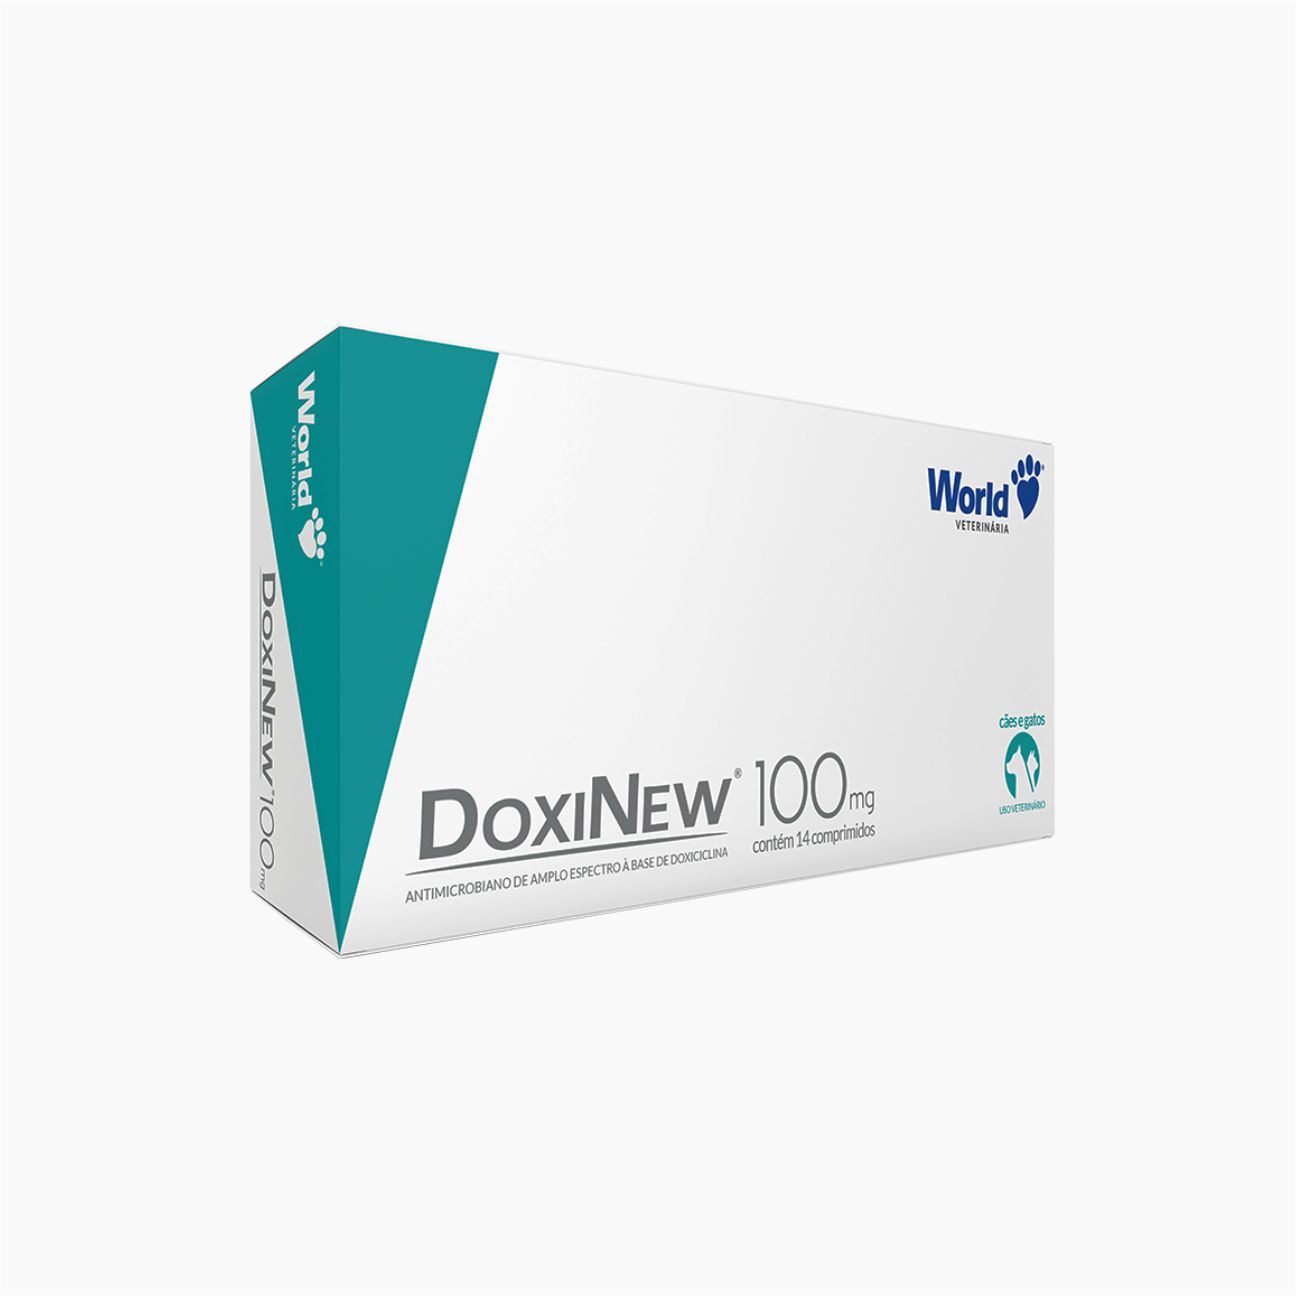 Doxinew 100mg